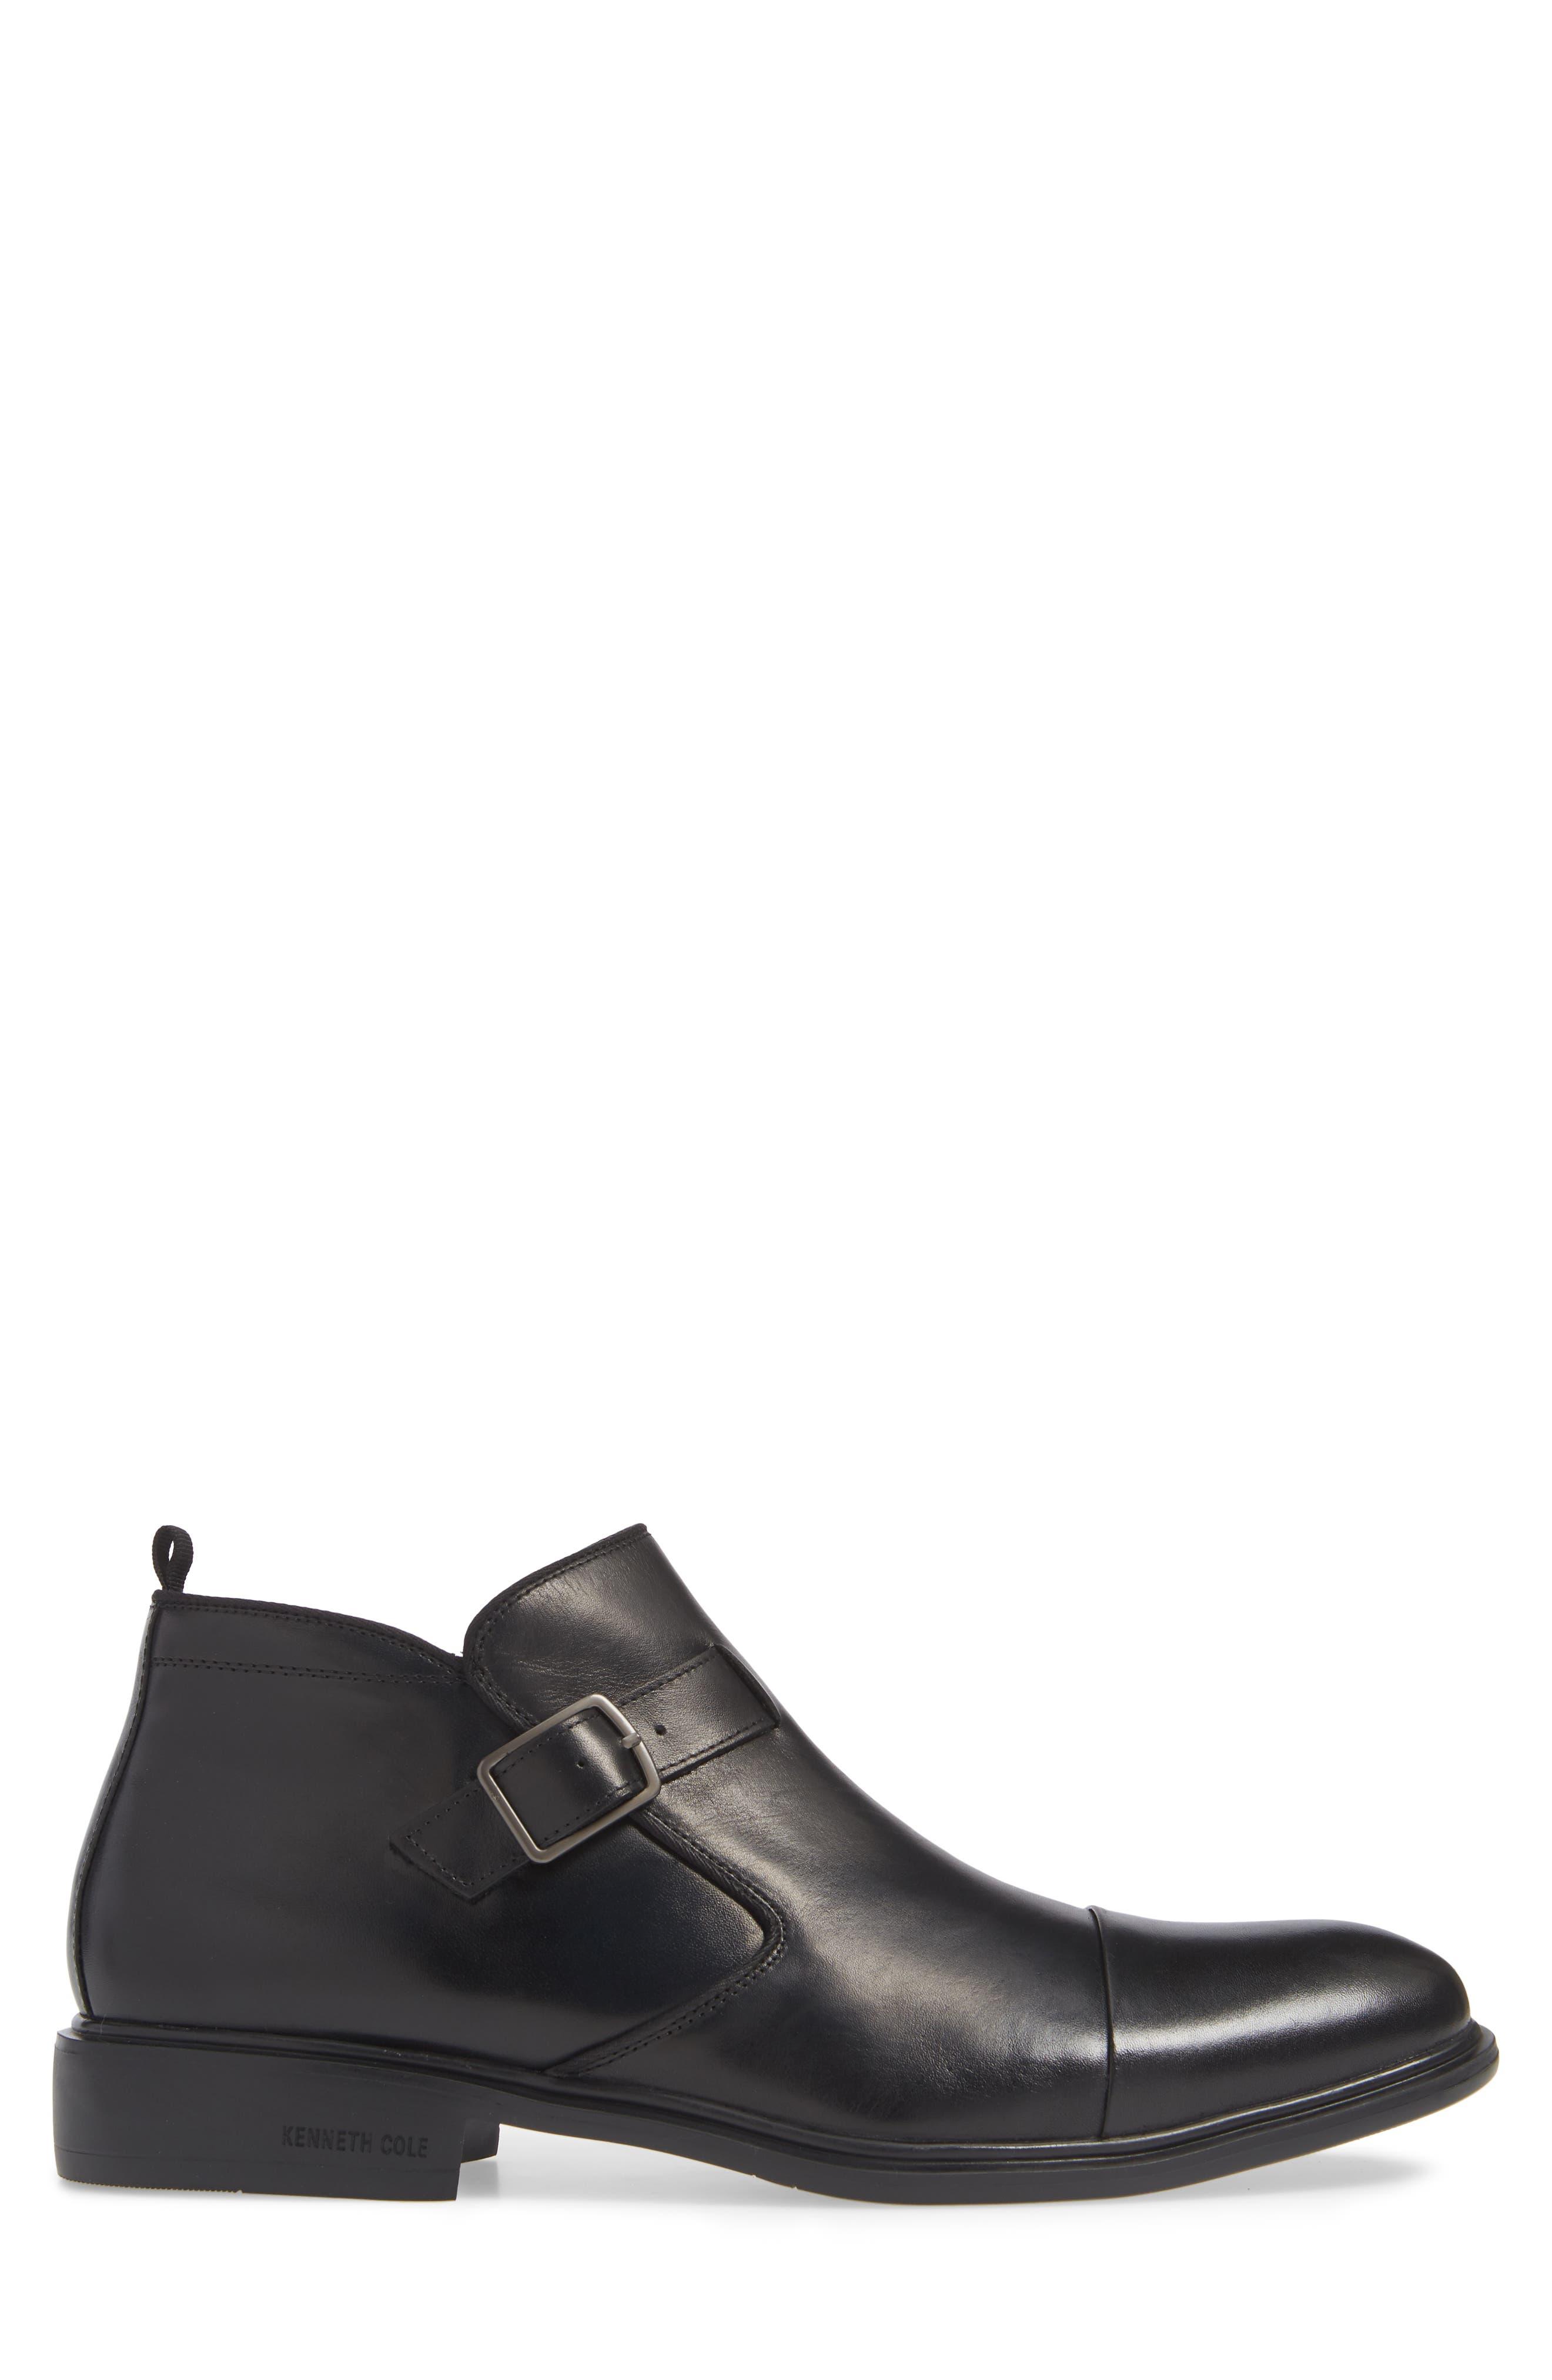 Garner Zip Boot,                             Alternate thumbnail 3, color,                             BLACK LEATHER